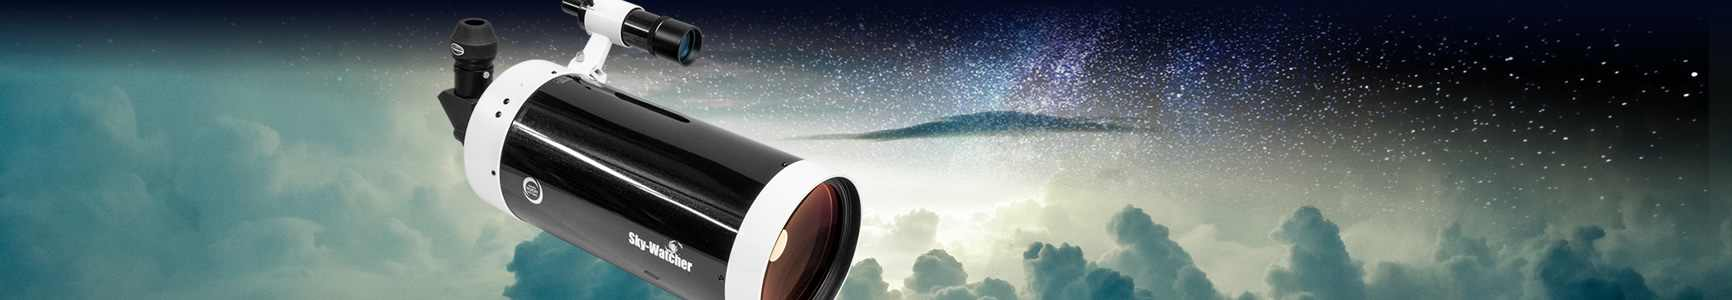 Cumpara un telescop Maksutov